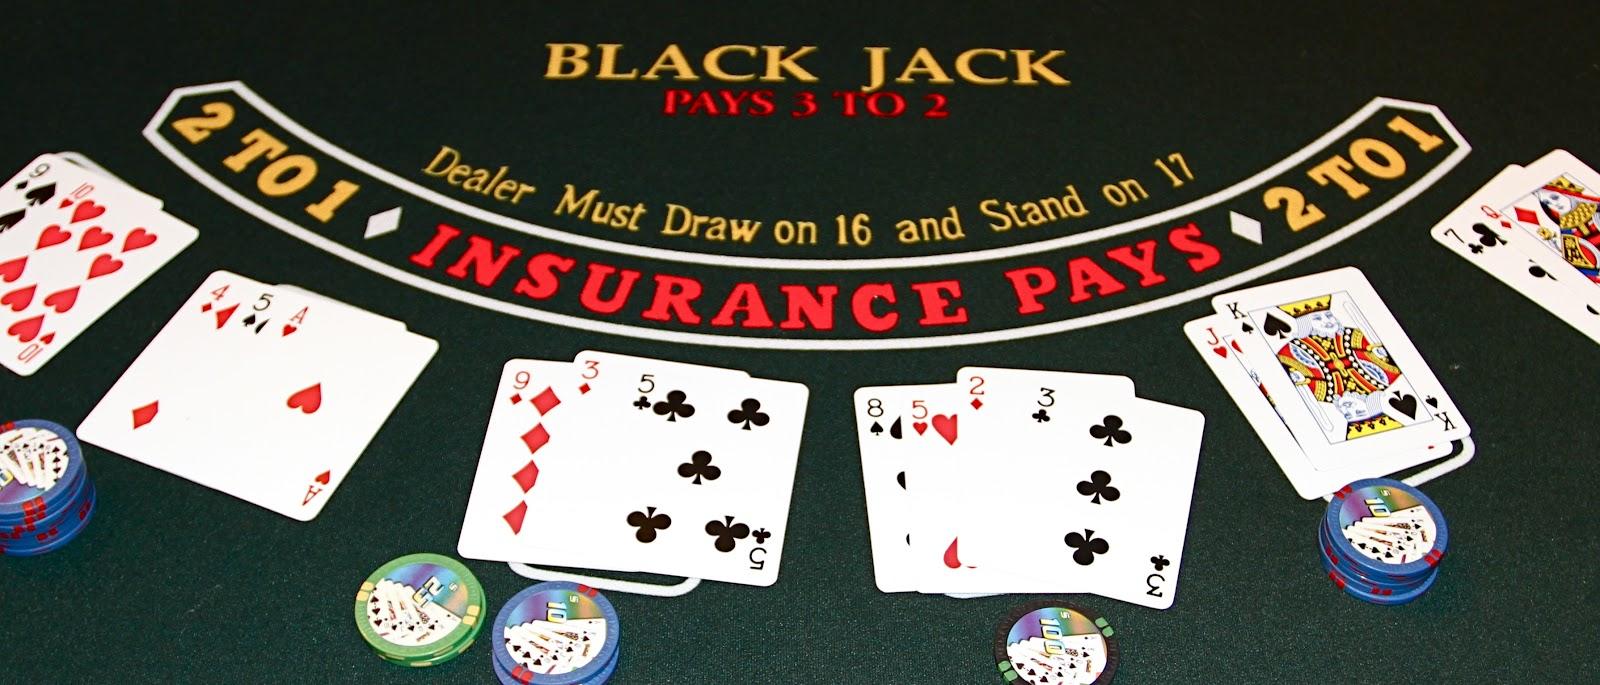 Jugar al blackjack 777